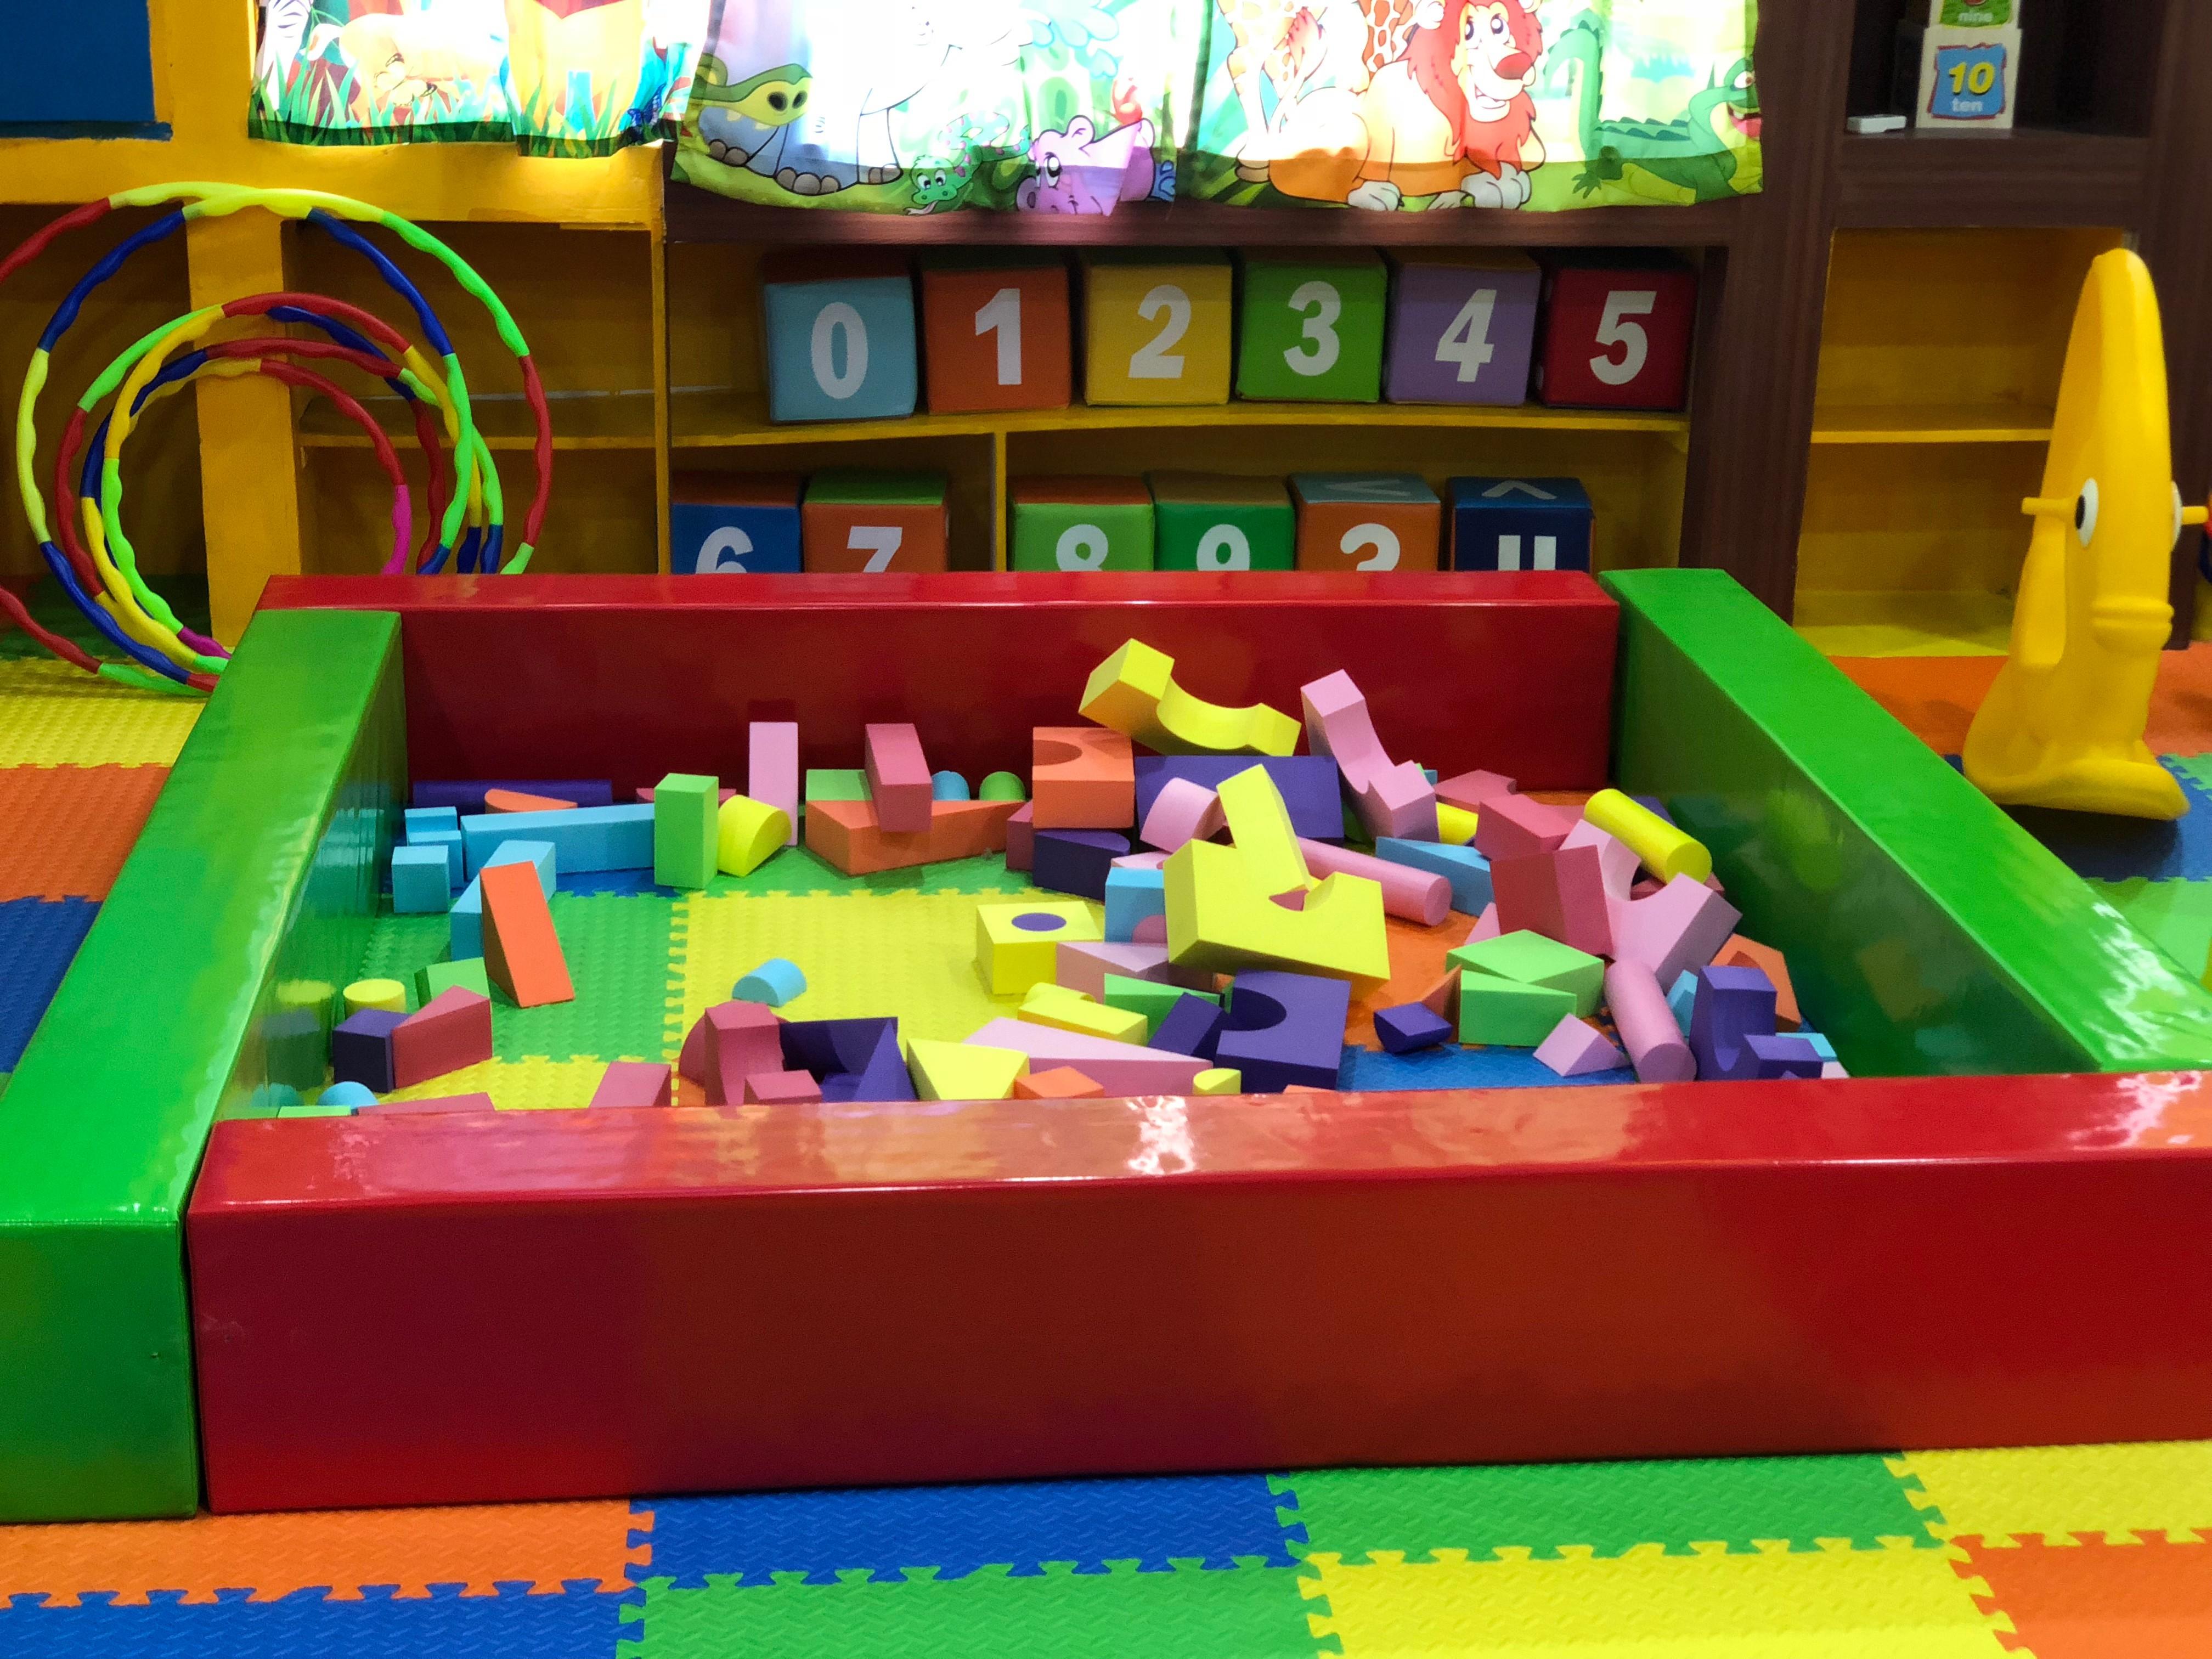 infant play zone 2 little fun world childrens playzone hsr